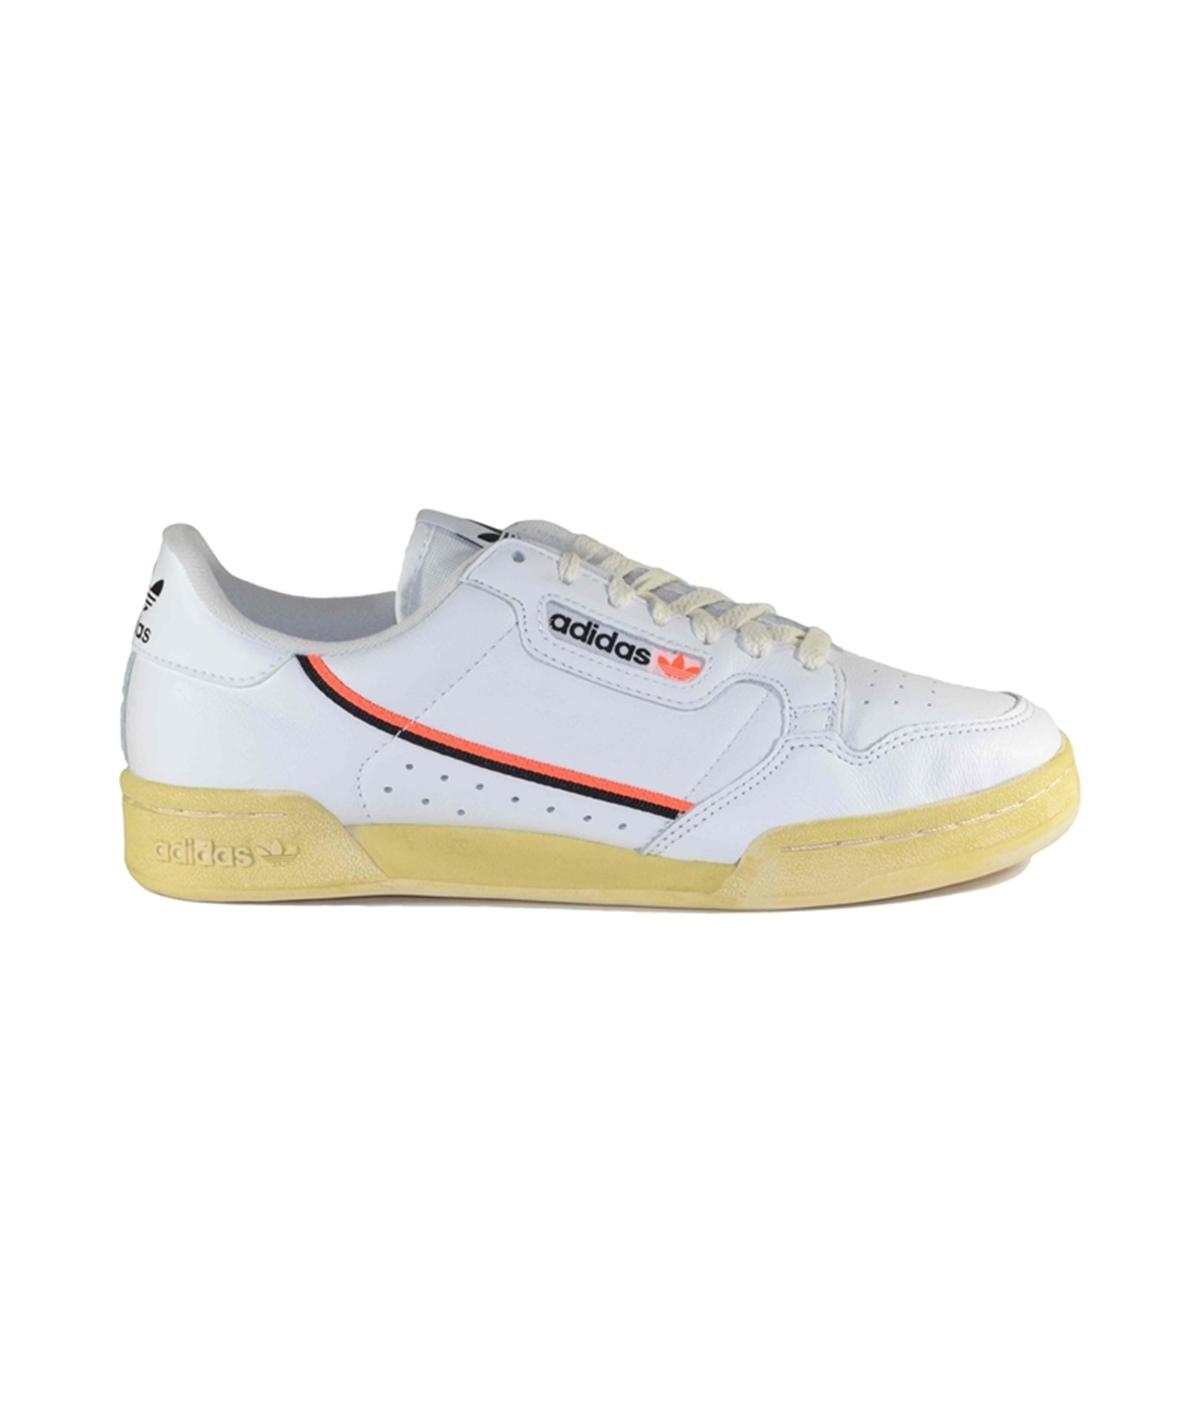 adidas-EF5991-Continental-80--white-orange-cream-black-1